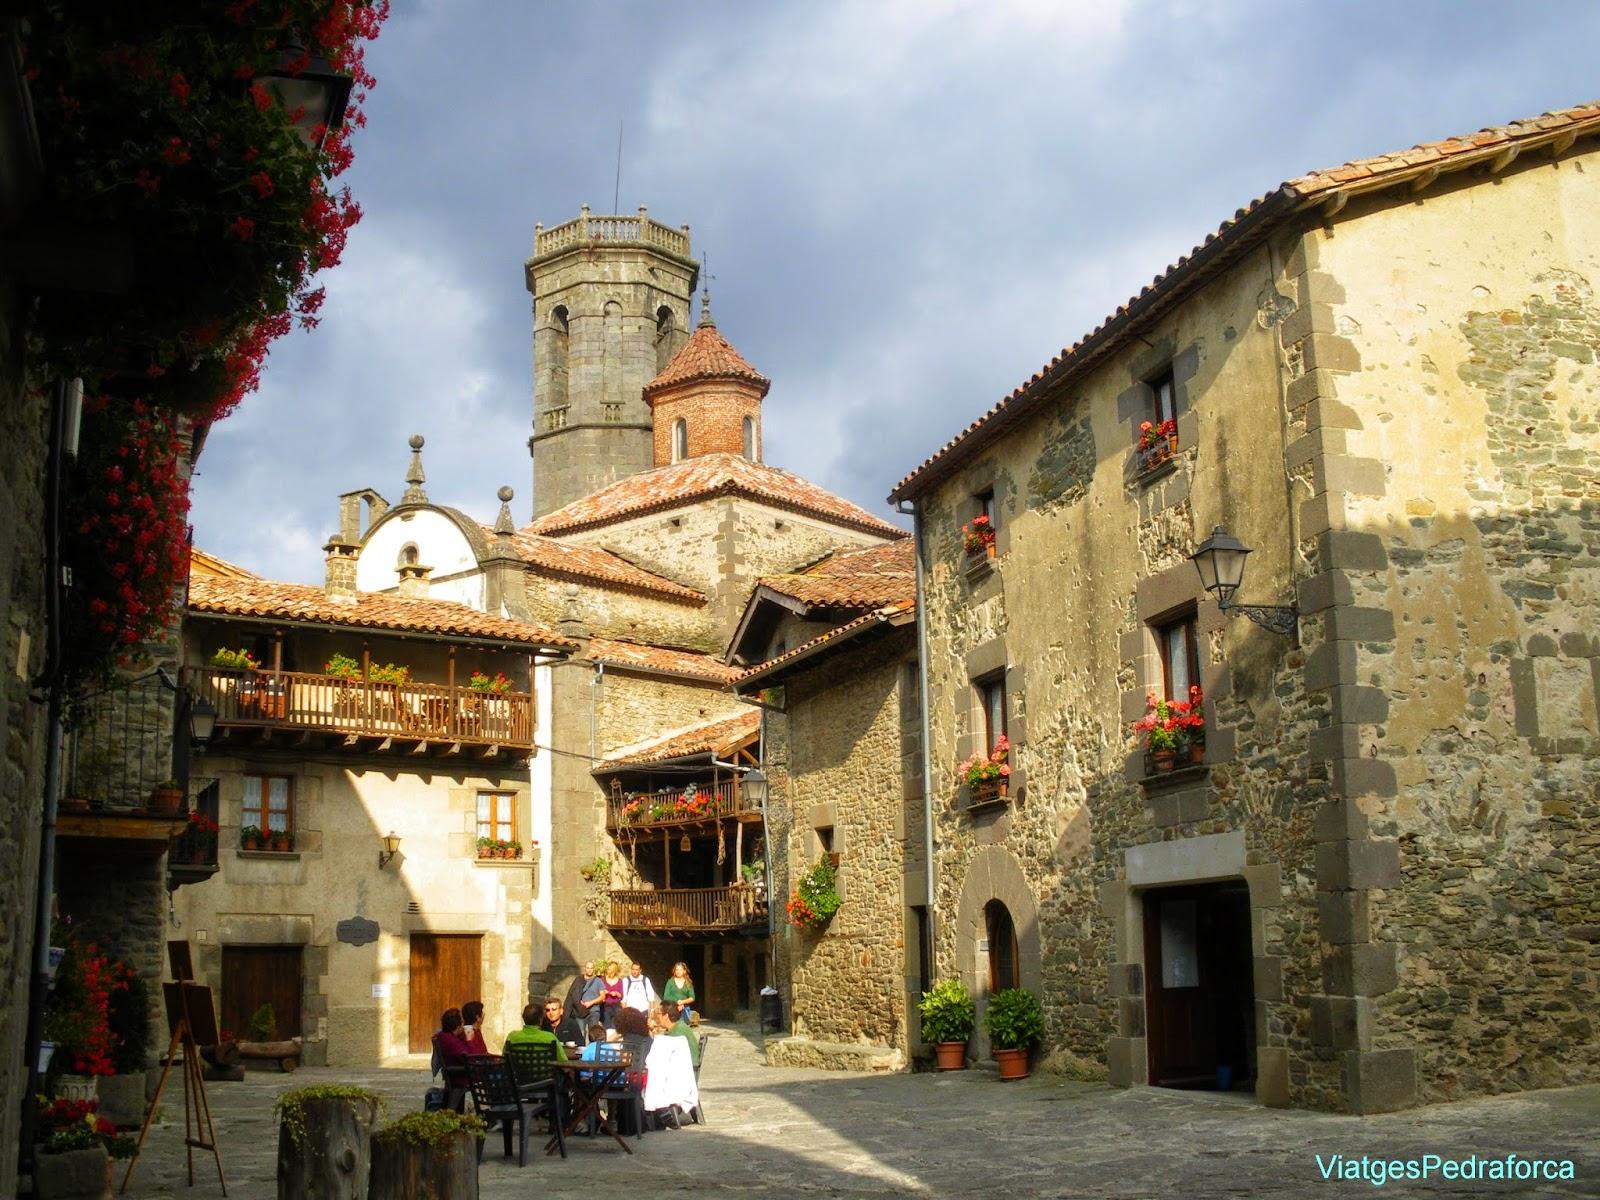 Rupit, Collsacabra, excursions d'un dia des de Barcelona